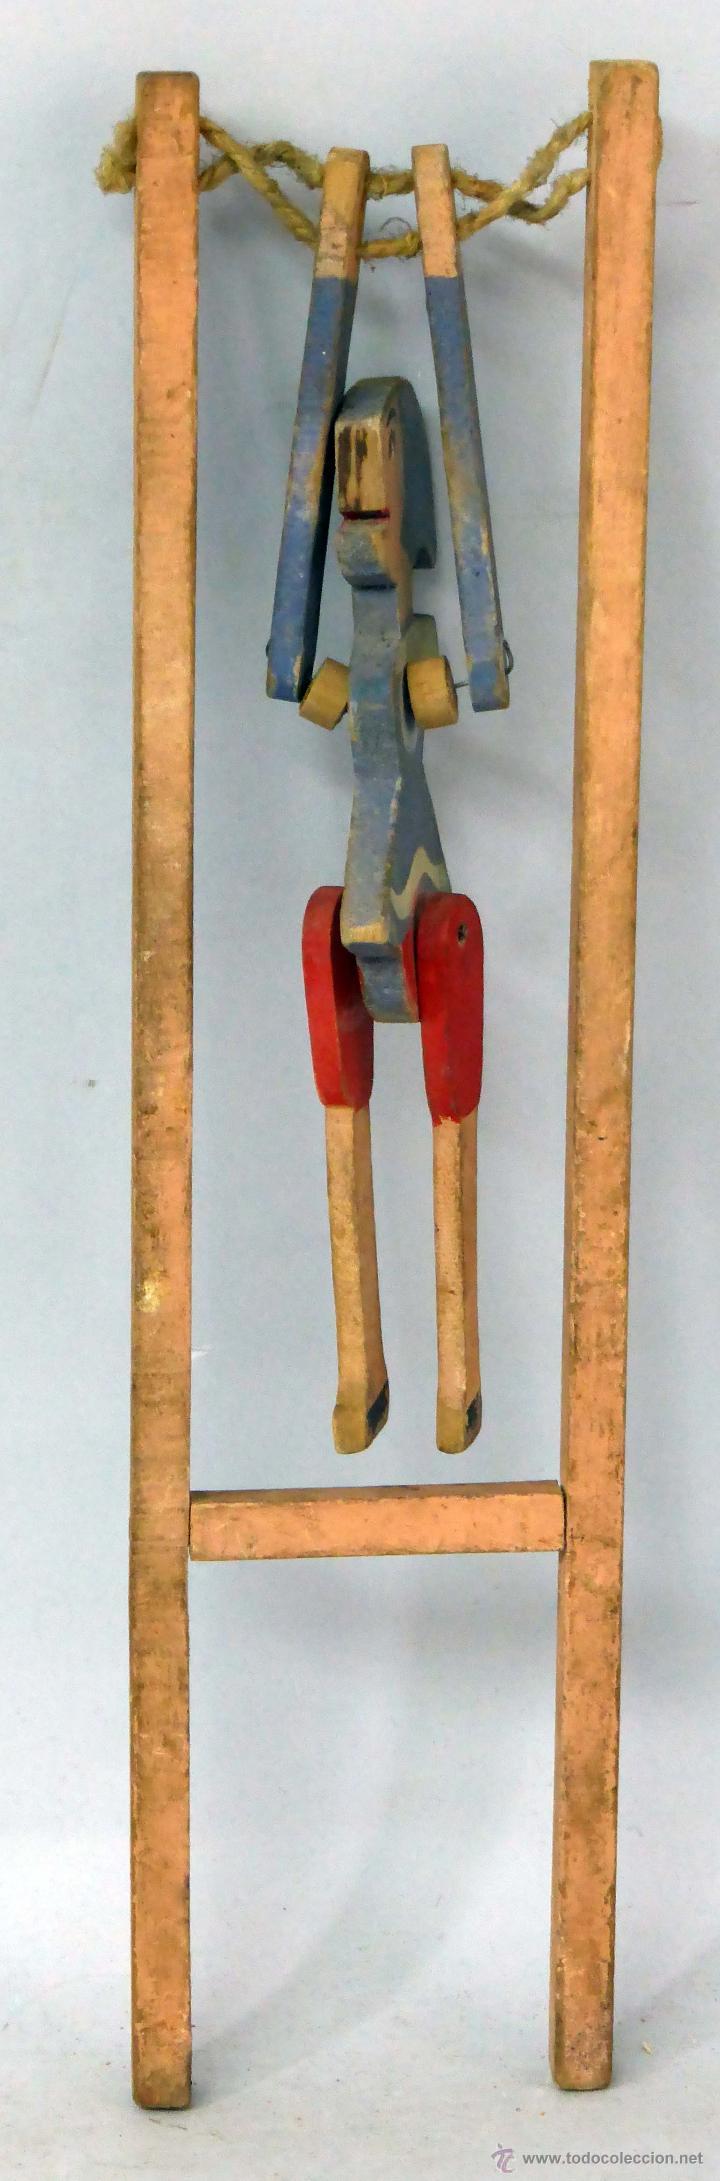 Pinocho trapecista madera denia a os 20 comprar juguetes - Juguetes antiguos de madera ...